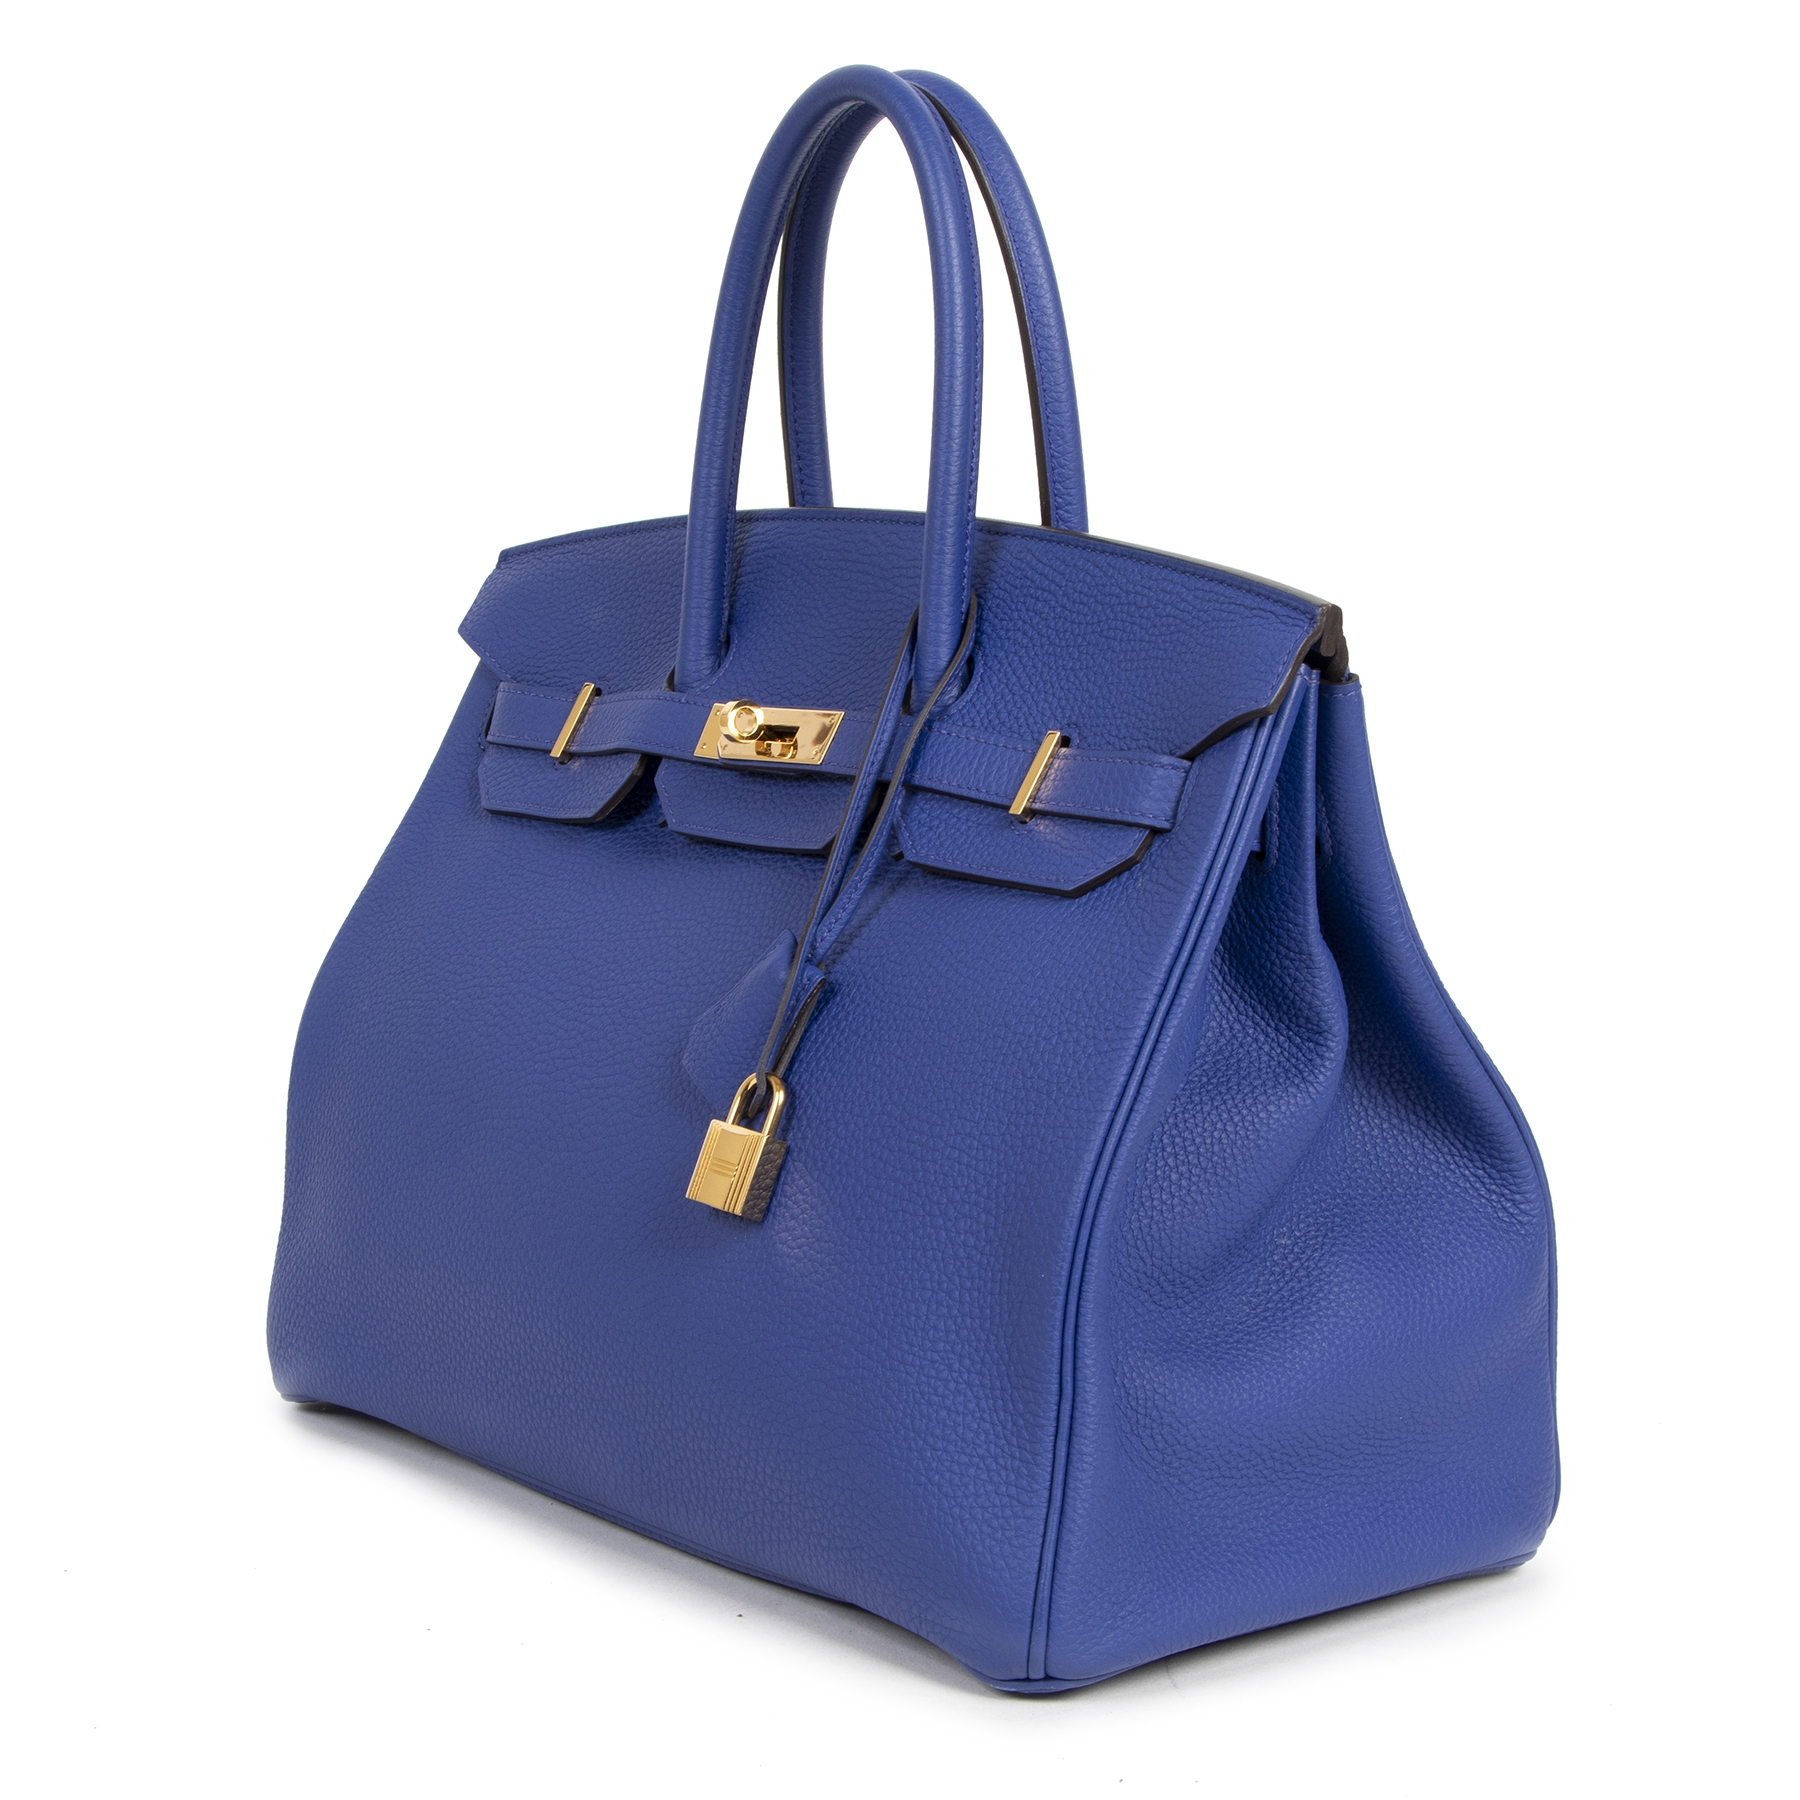 acheter en ligne seconde main As New Hermes Birkin 35 Blue Electrique GHW